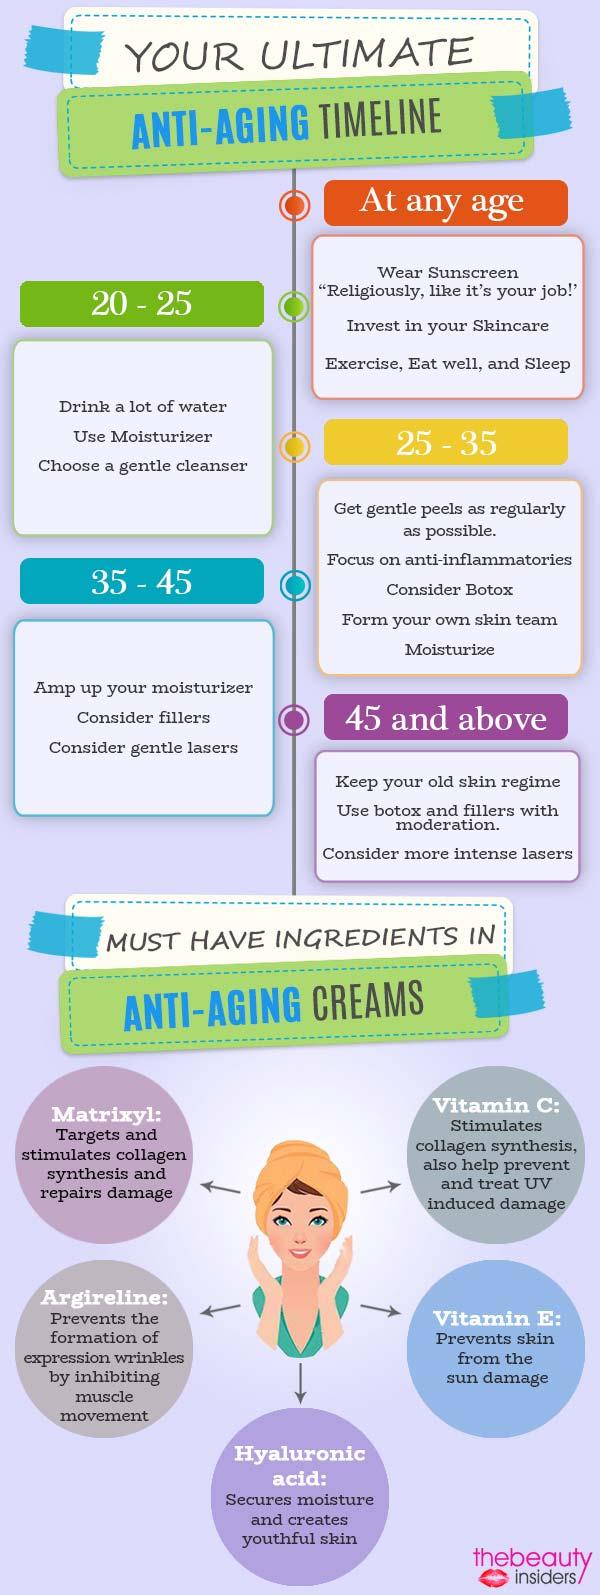 Anti-aging Timeline Info